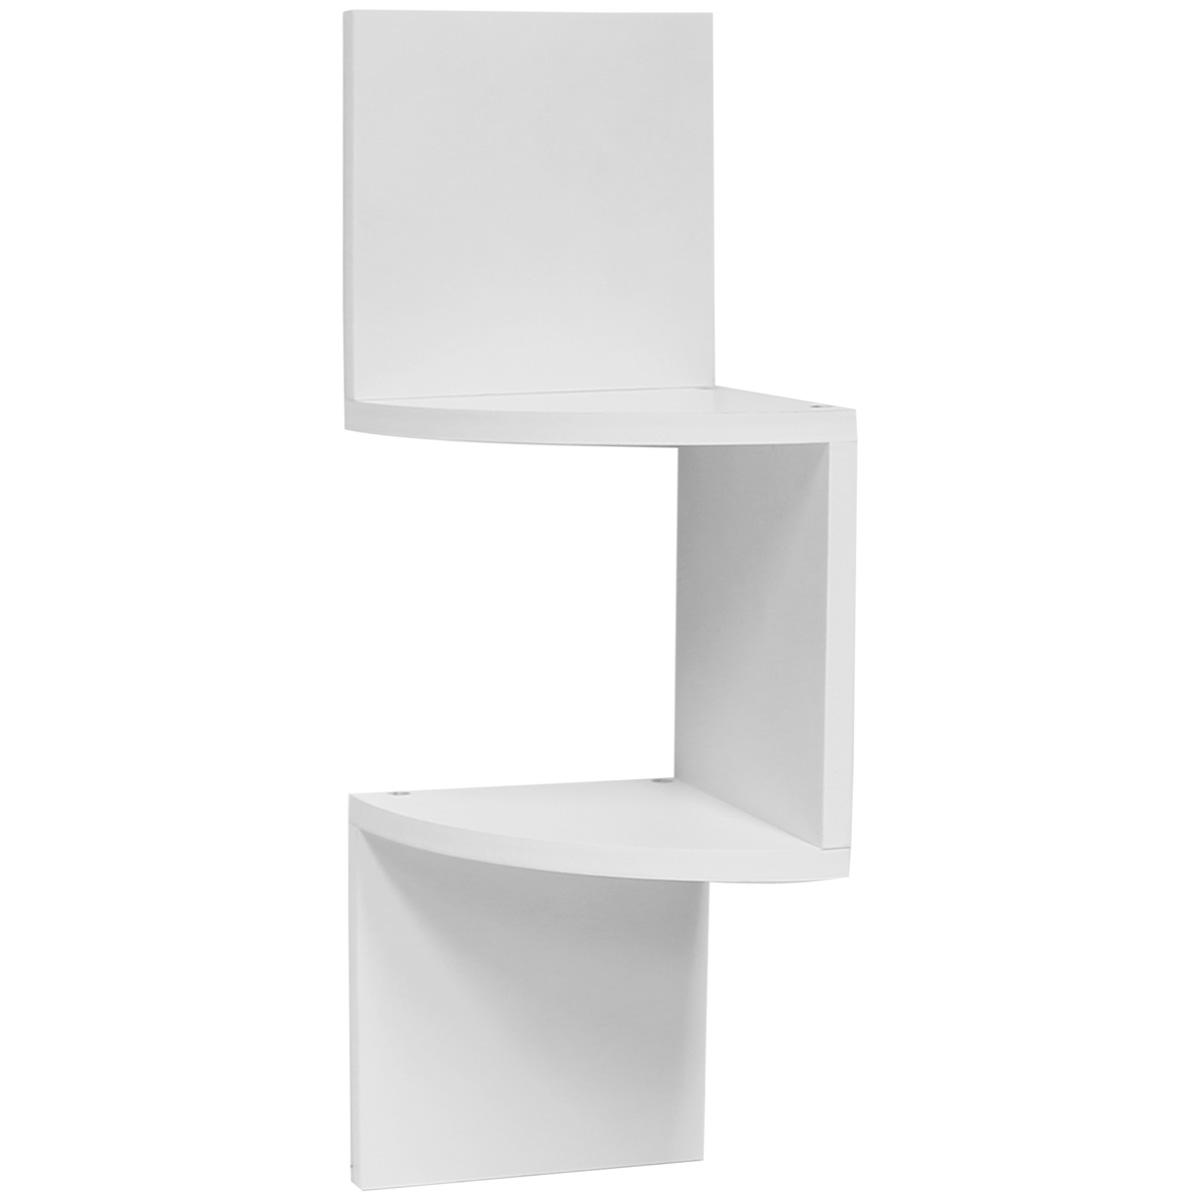 Hartleys zig zag wood floating corner wall shelf unit modern display shelving ebay - Contemporary corner shelves ...